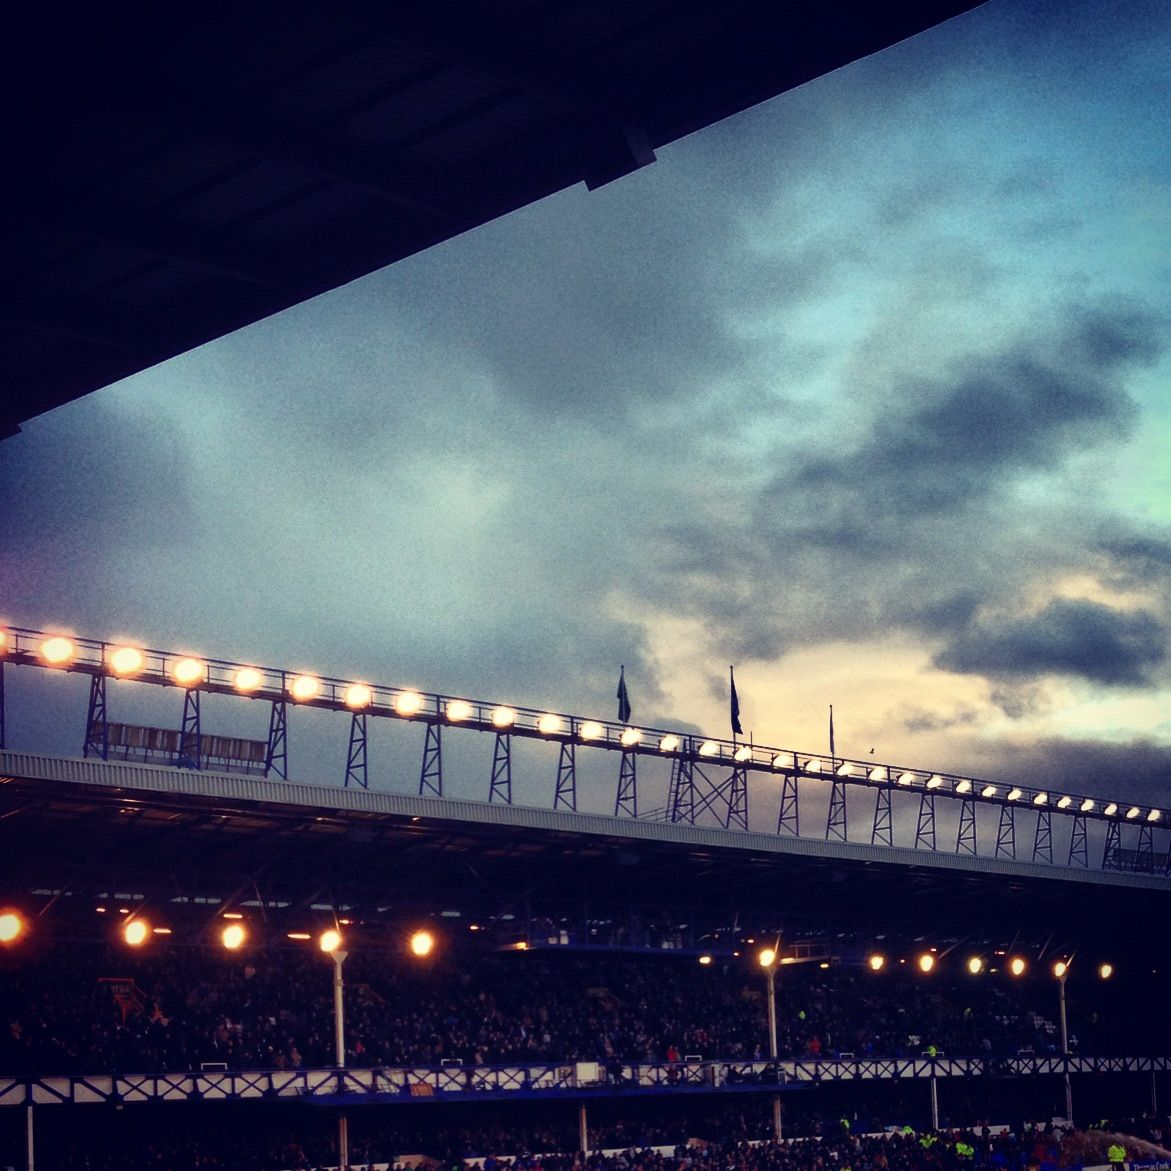 Bobs Gmc Milford Ct: Goodison Park, Everton Fc